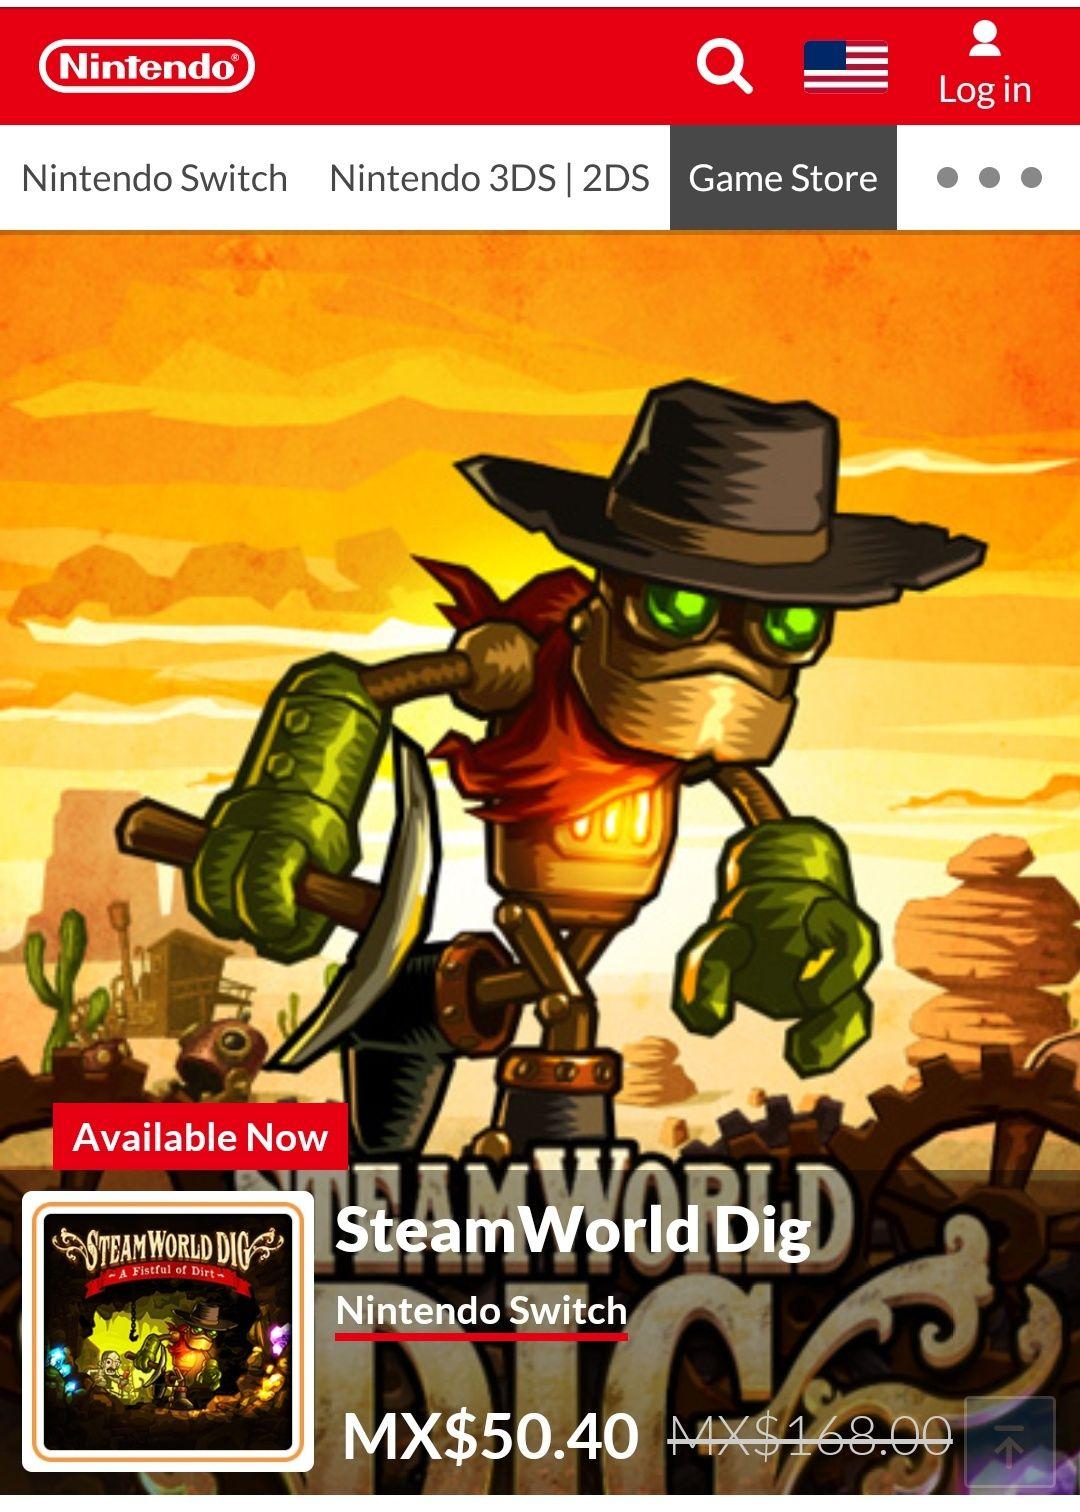 Nintendo eshop: SteamWorld Dig